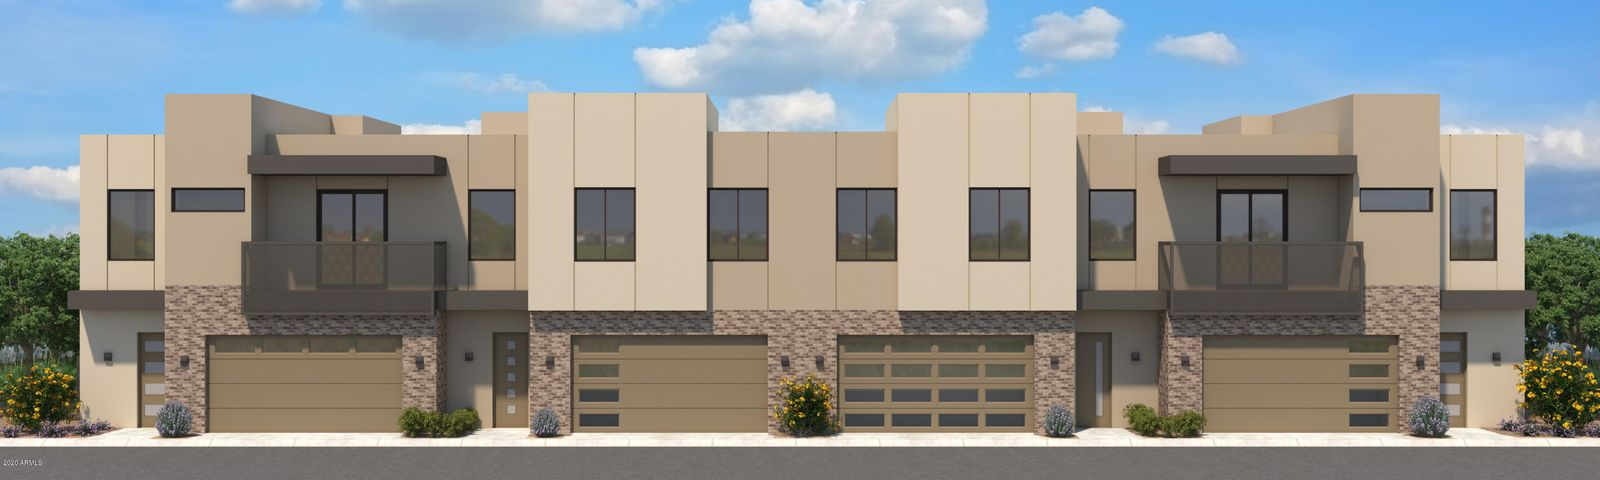 901 S Smith Road, 1071, Tempe, AZ 85281